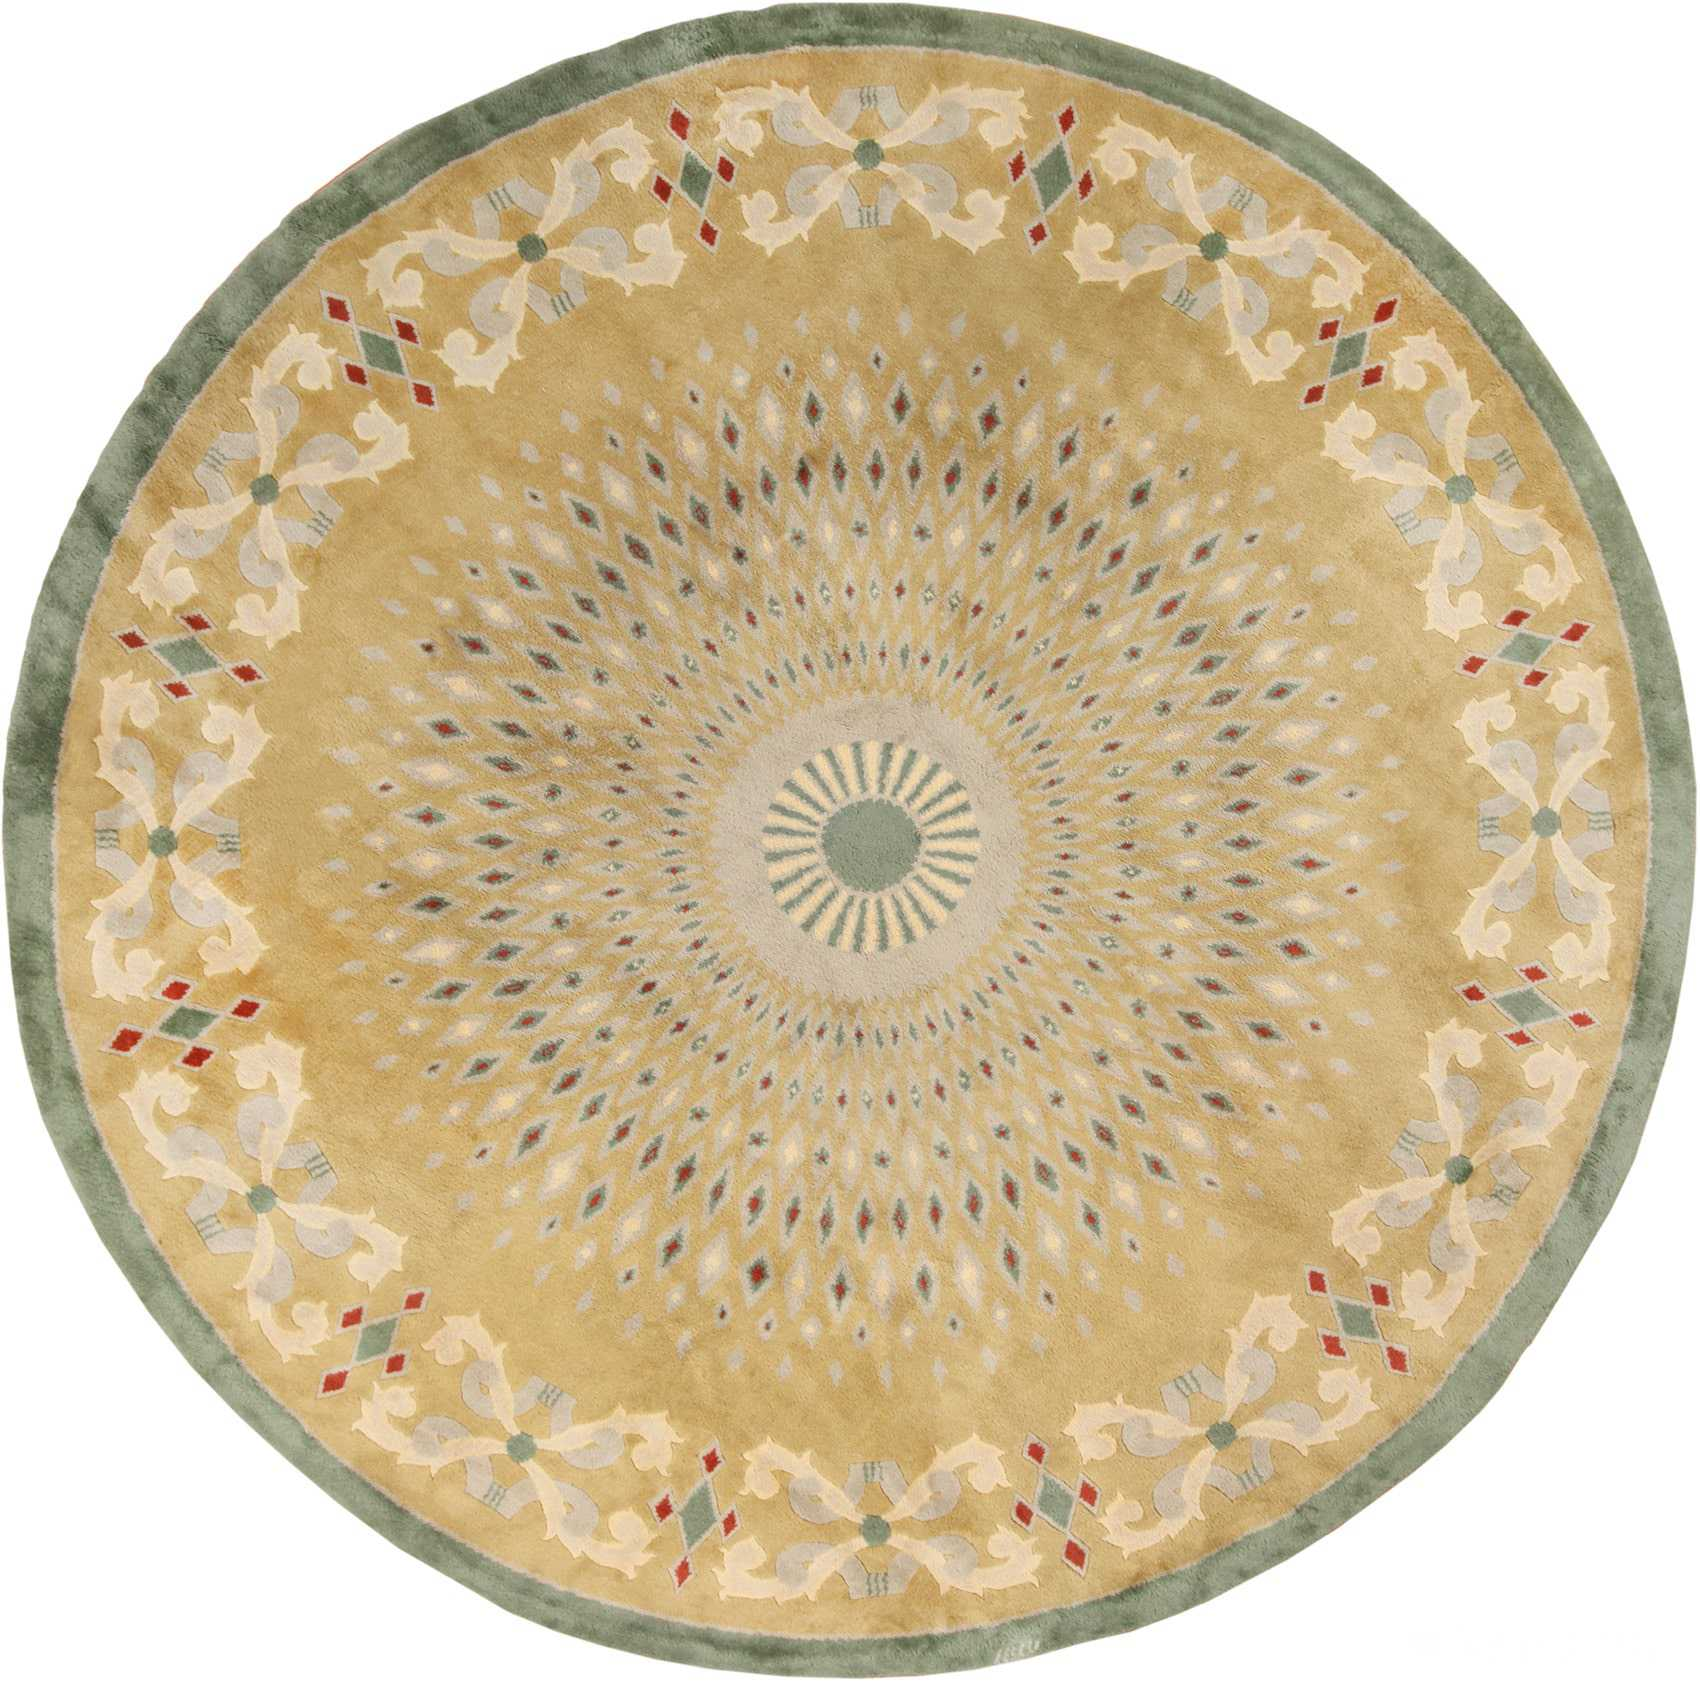 Antique Round French Art Deco Rug by Leleu 49693 Nazmiyal